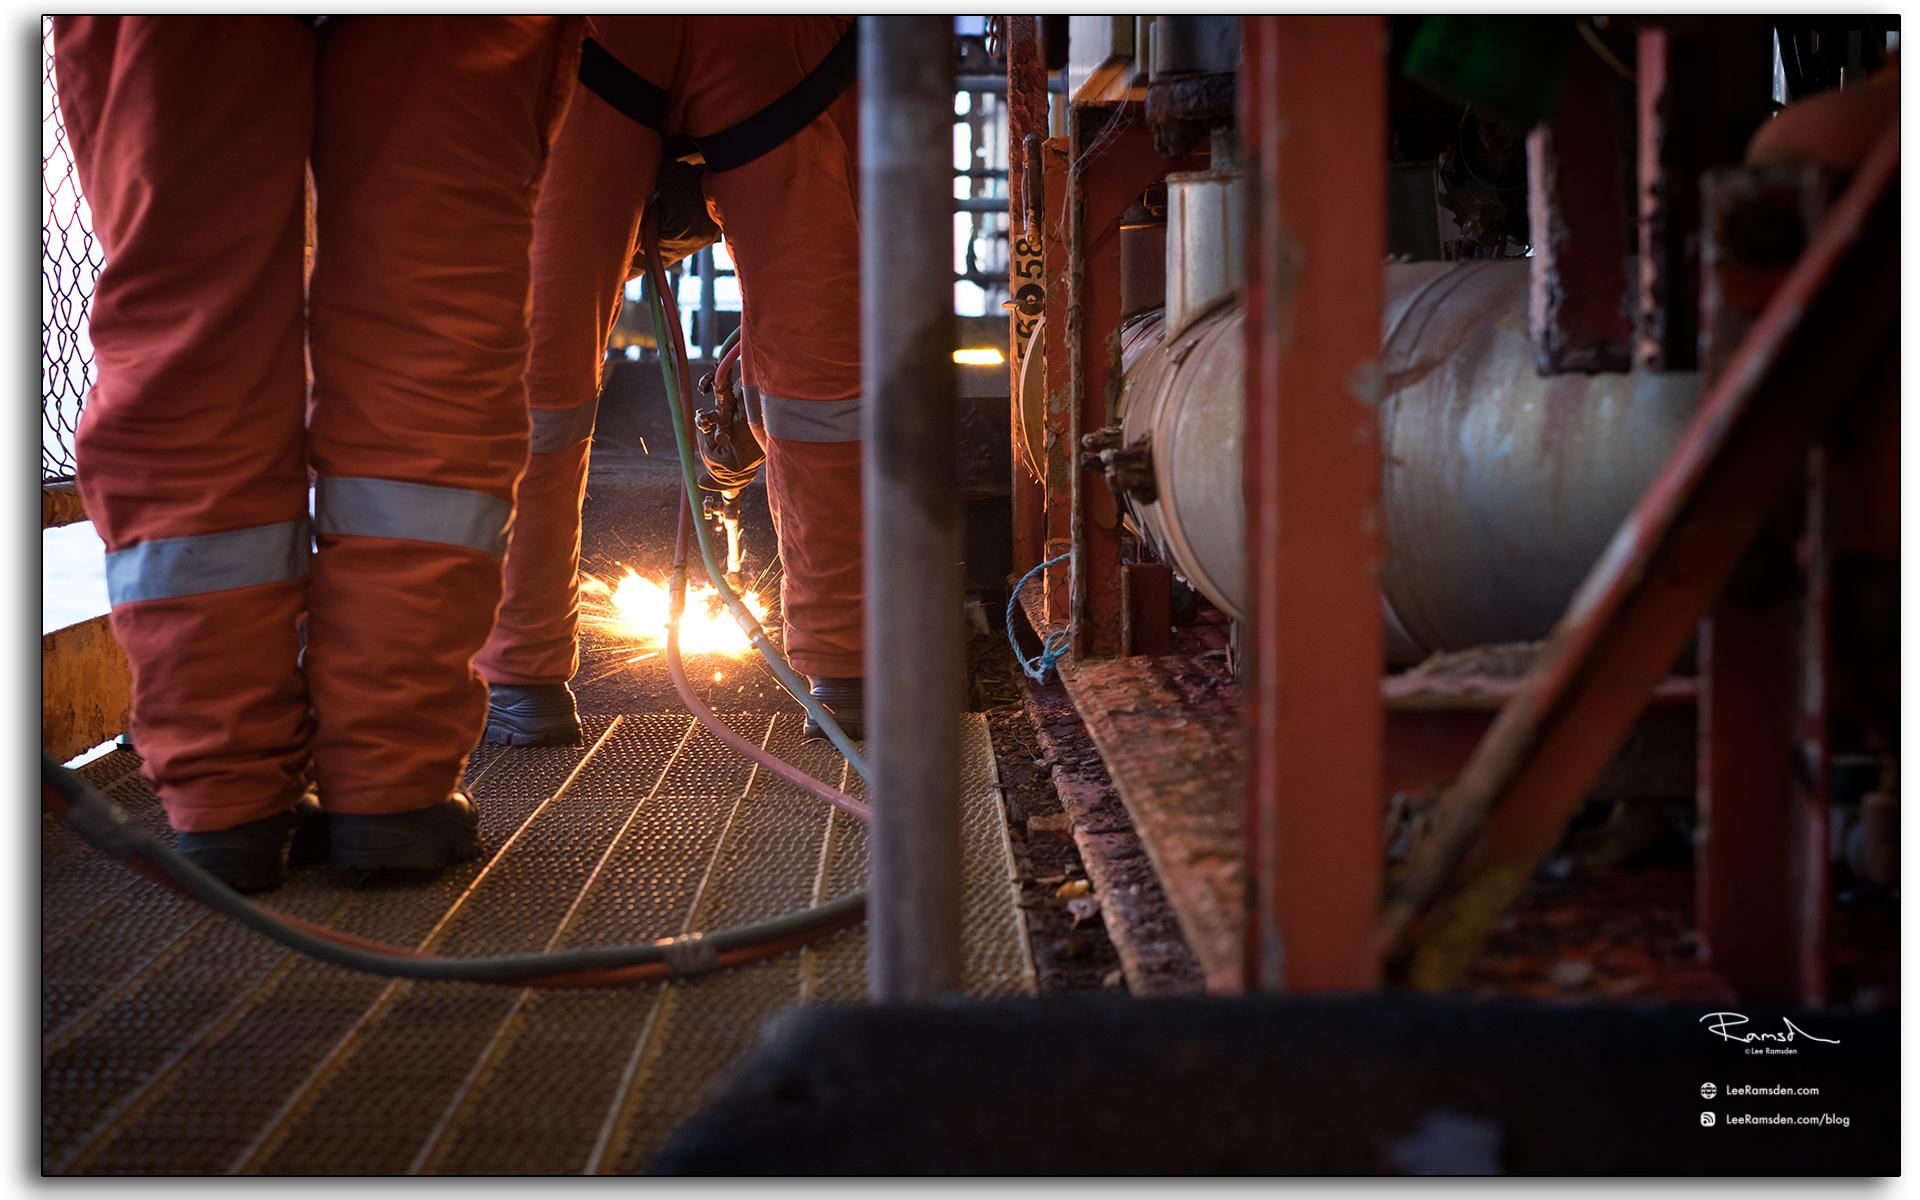 BP Miller, decommissioning, Petrofac, Saipem, BP, buring, oxygen, acetylene, rig removal, industrial, north sea, photo taken by Lee Ramsden